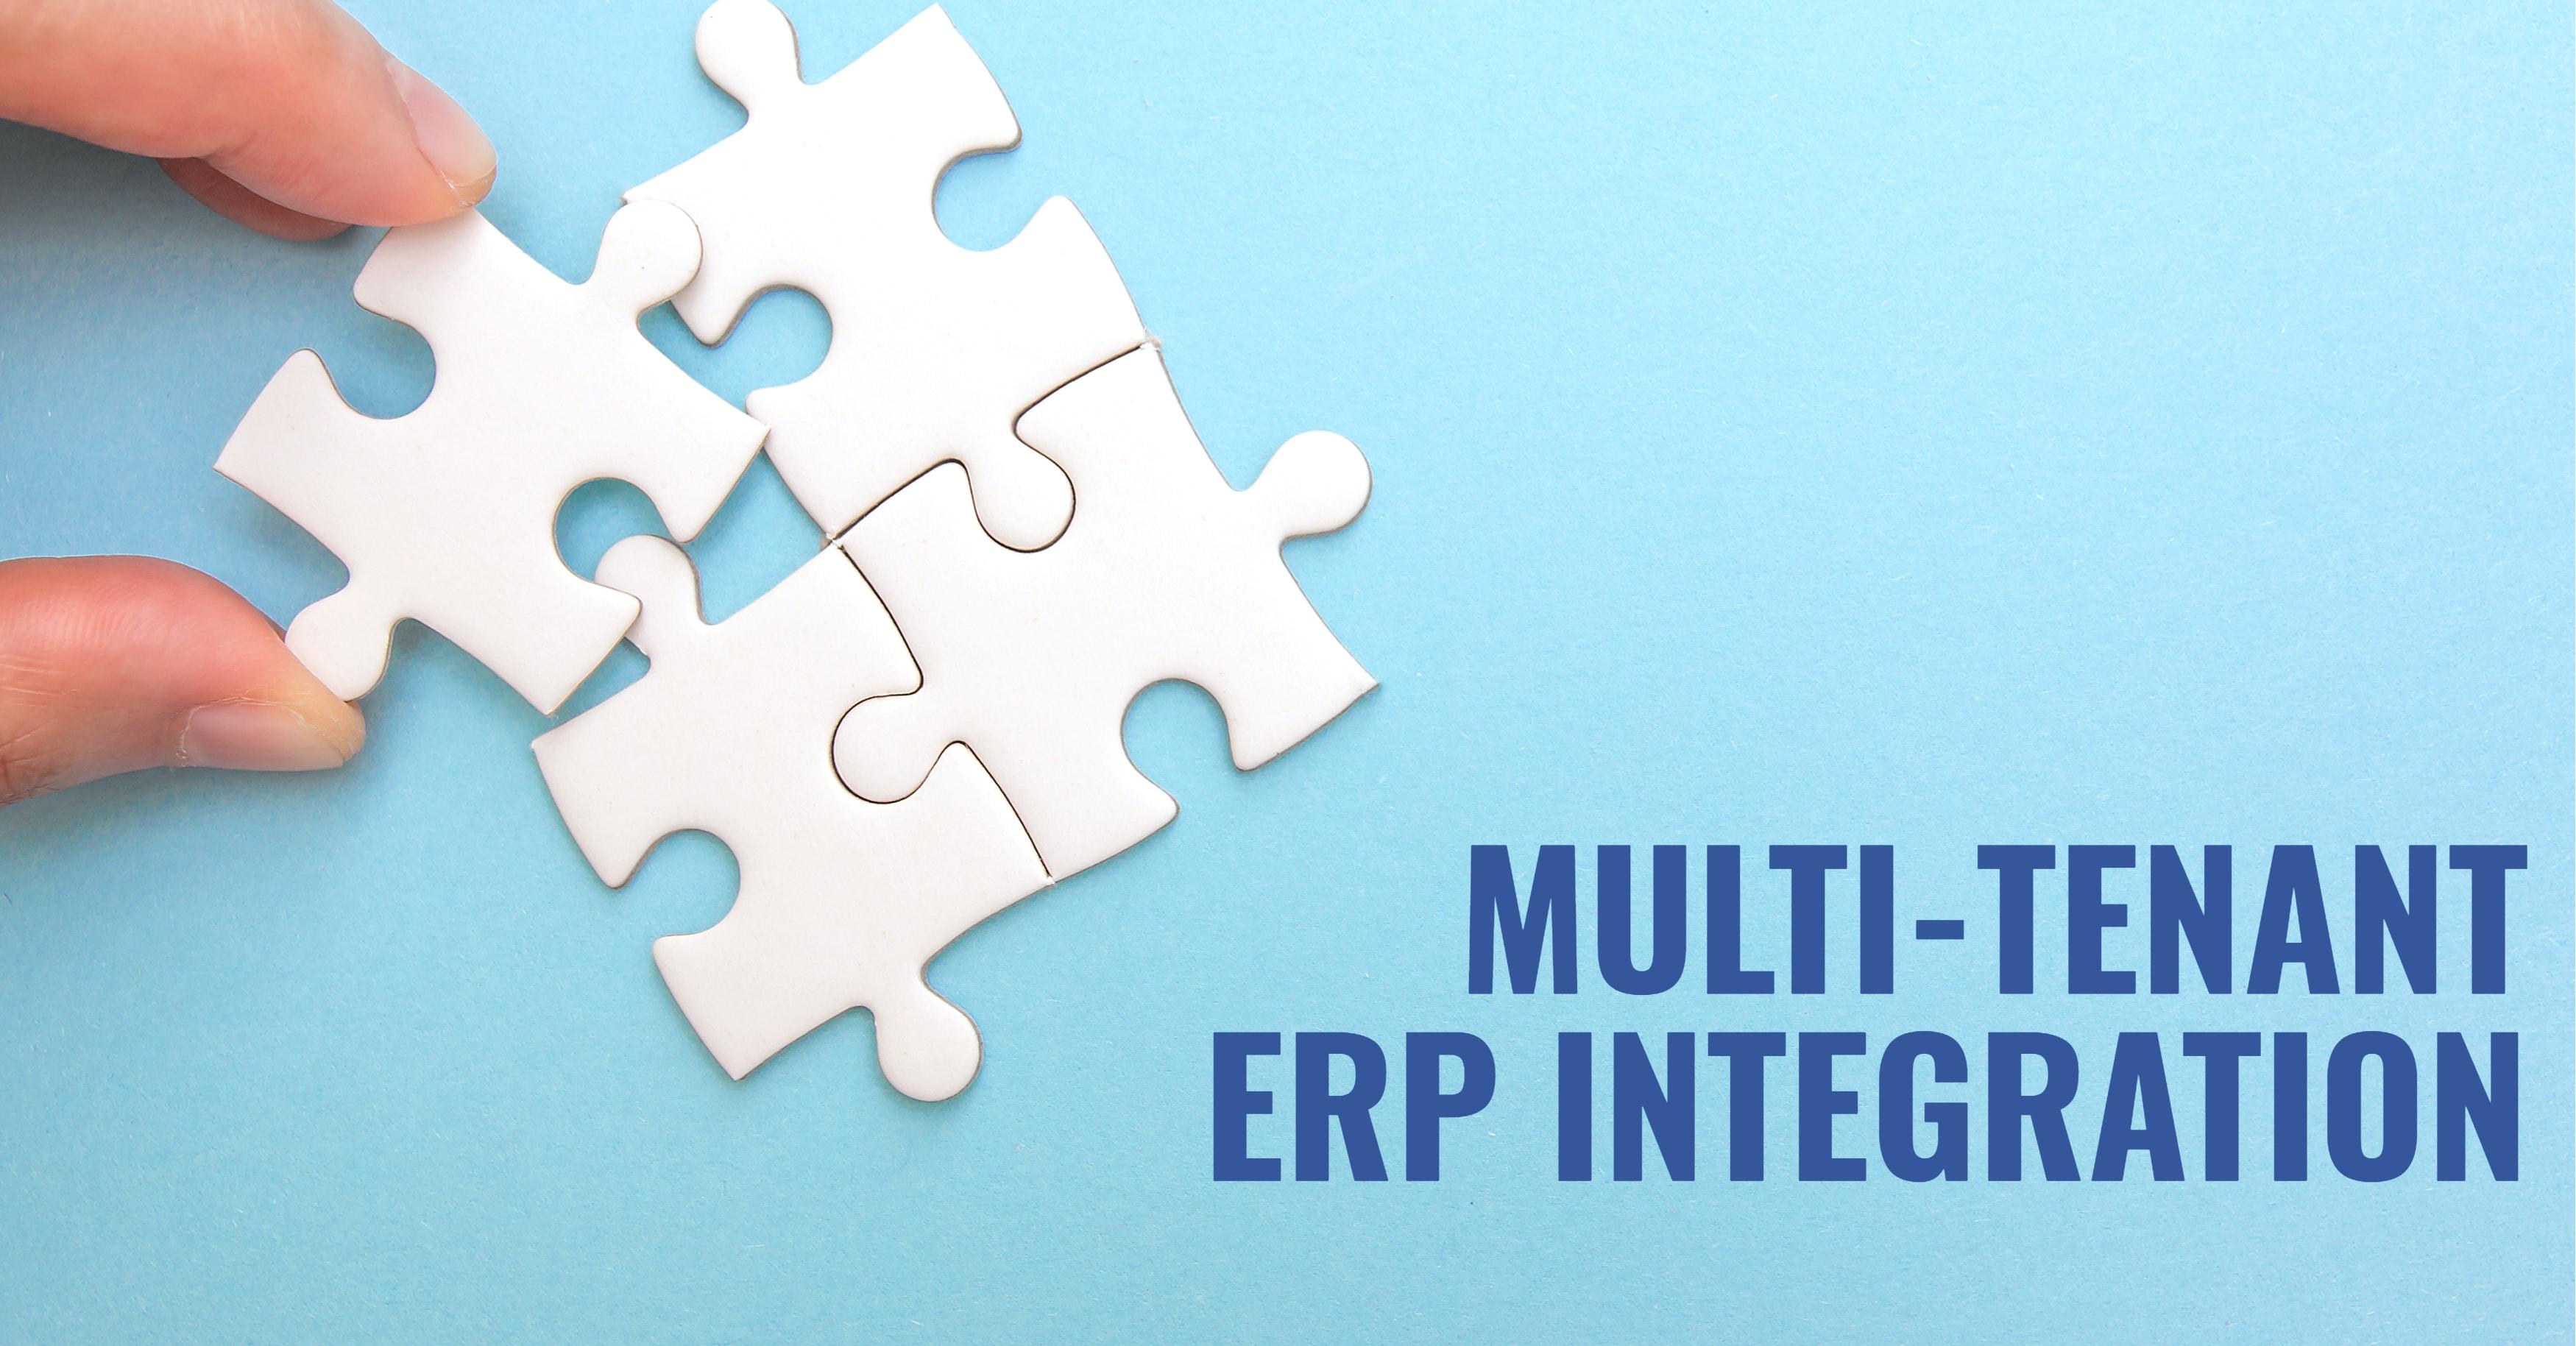 Multi-Tenant ERP Integration